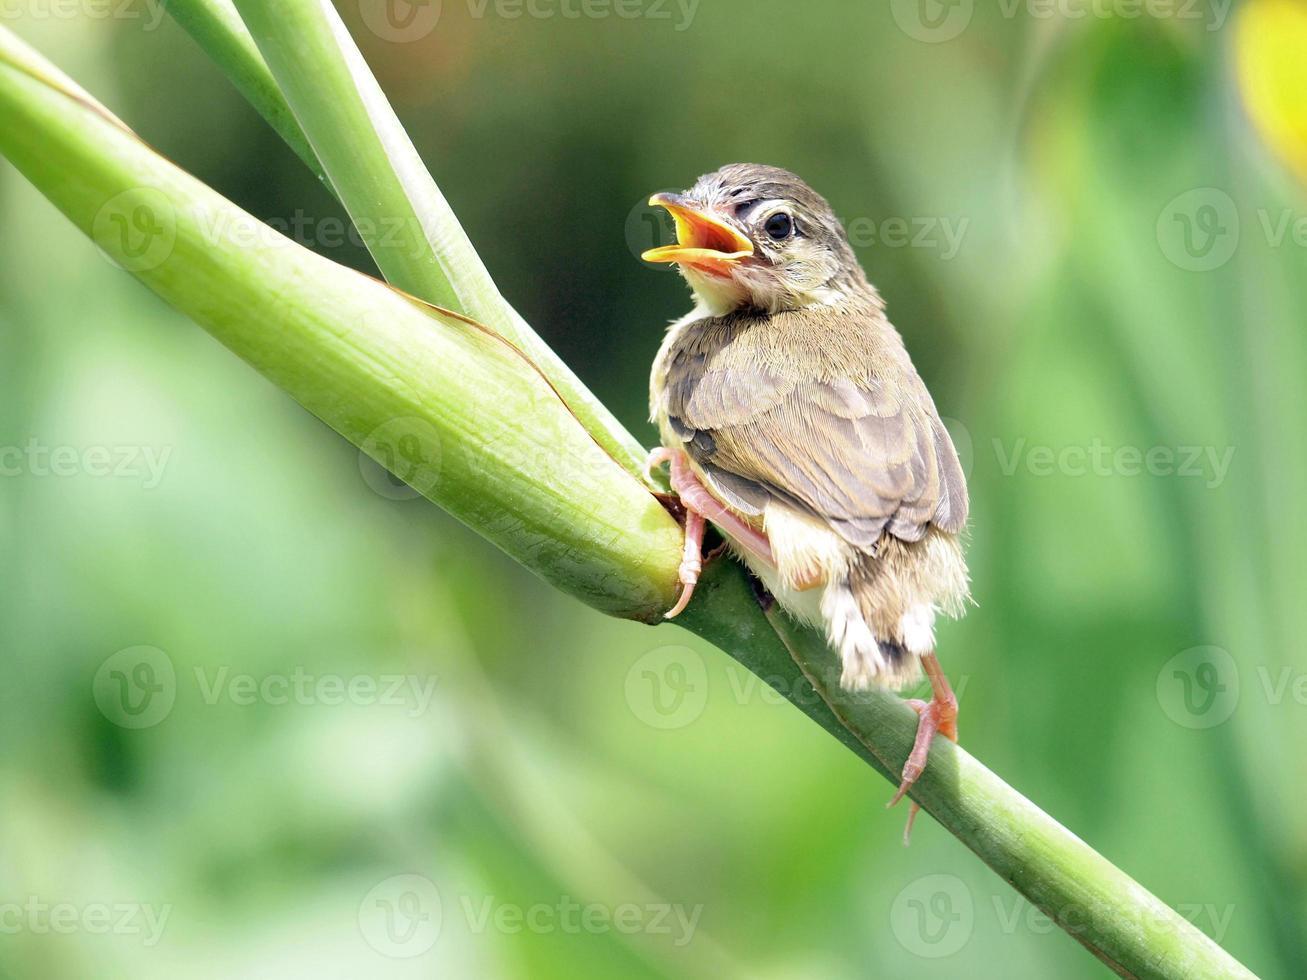 Close up view of nice little bird photo